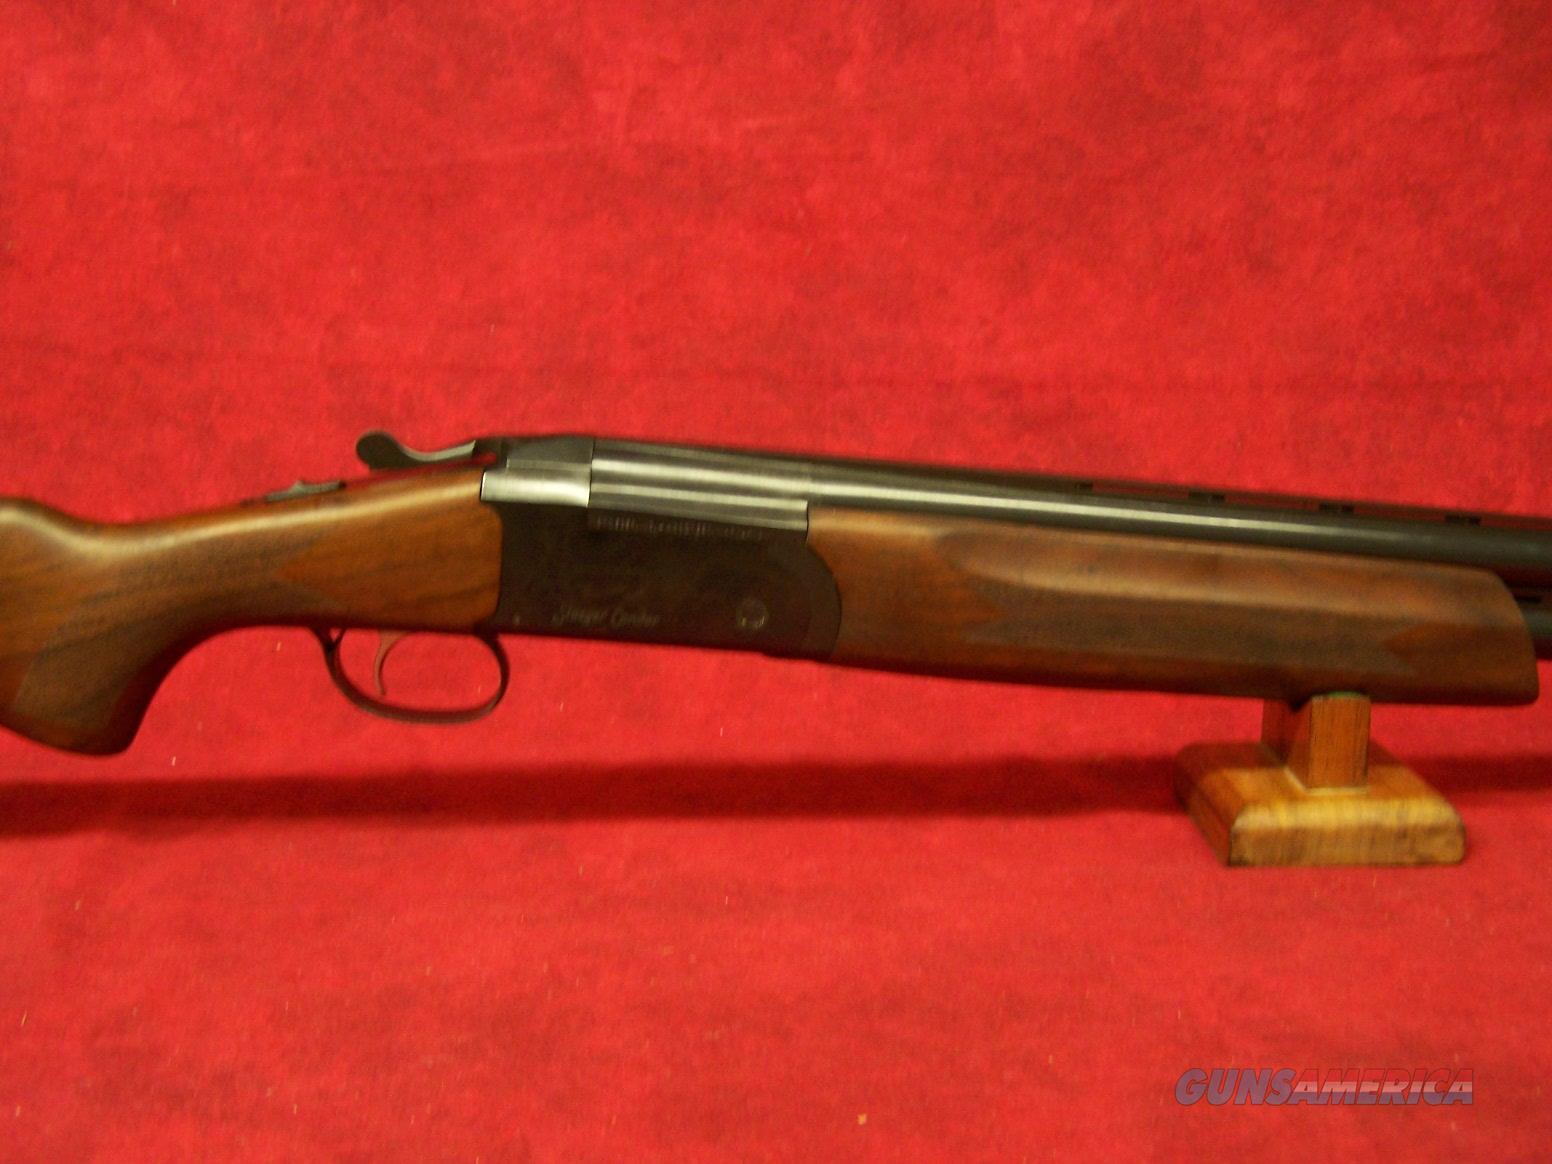 "Stoeger Condor 12Ga 3"" O/U A-Grade Satin Walnut 26"" Barrel (31025)  Guns > Shotguns > Stoeger Shotguns"